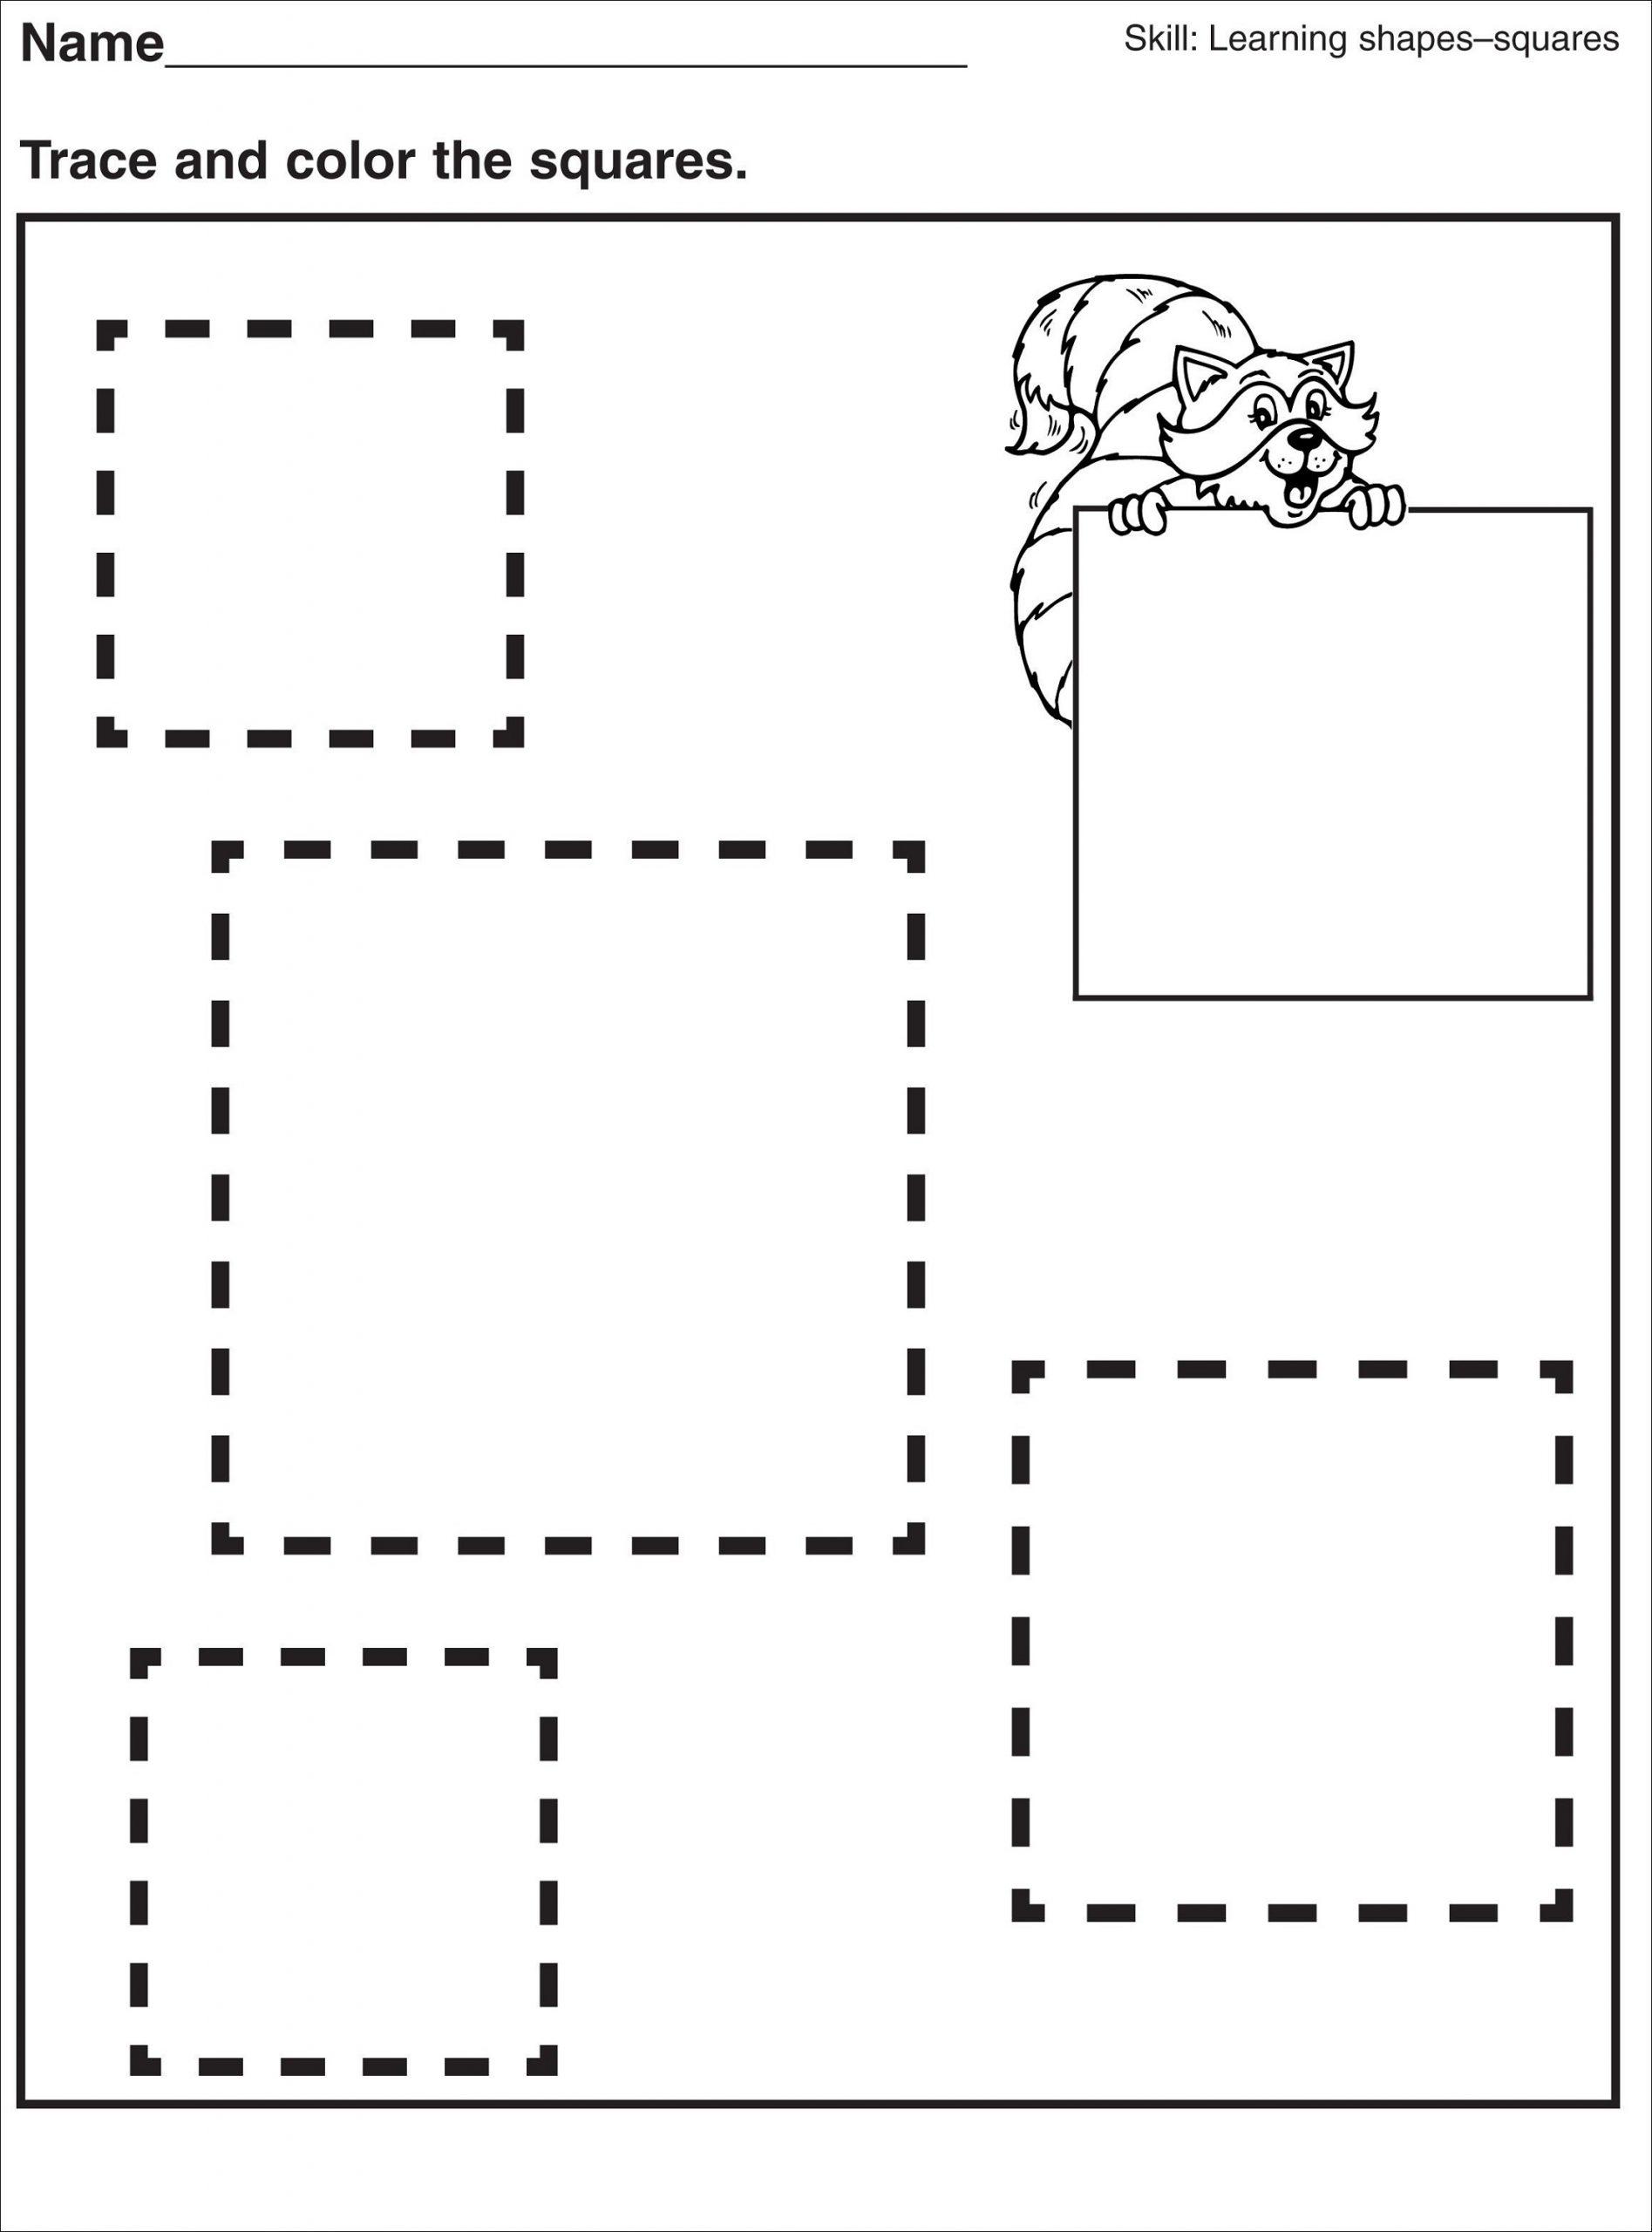 Pre-K Worksheets Printable Square